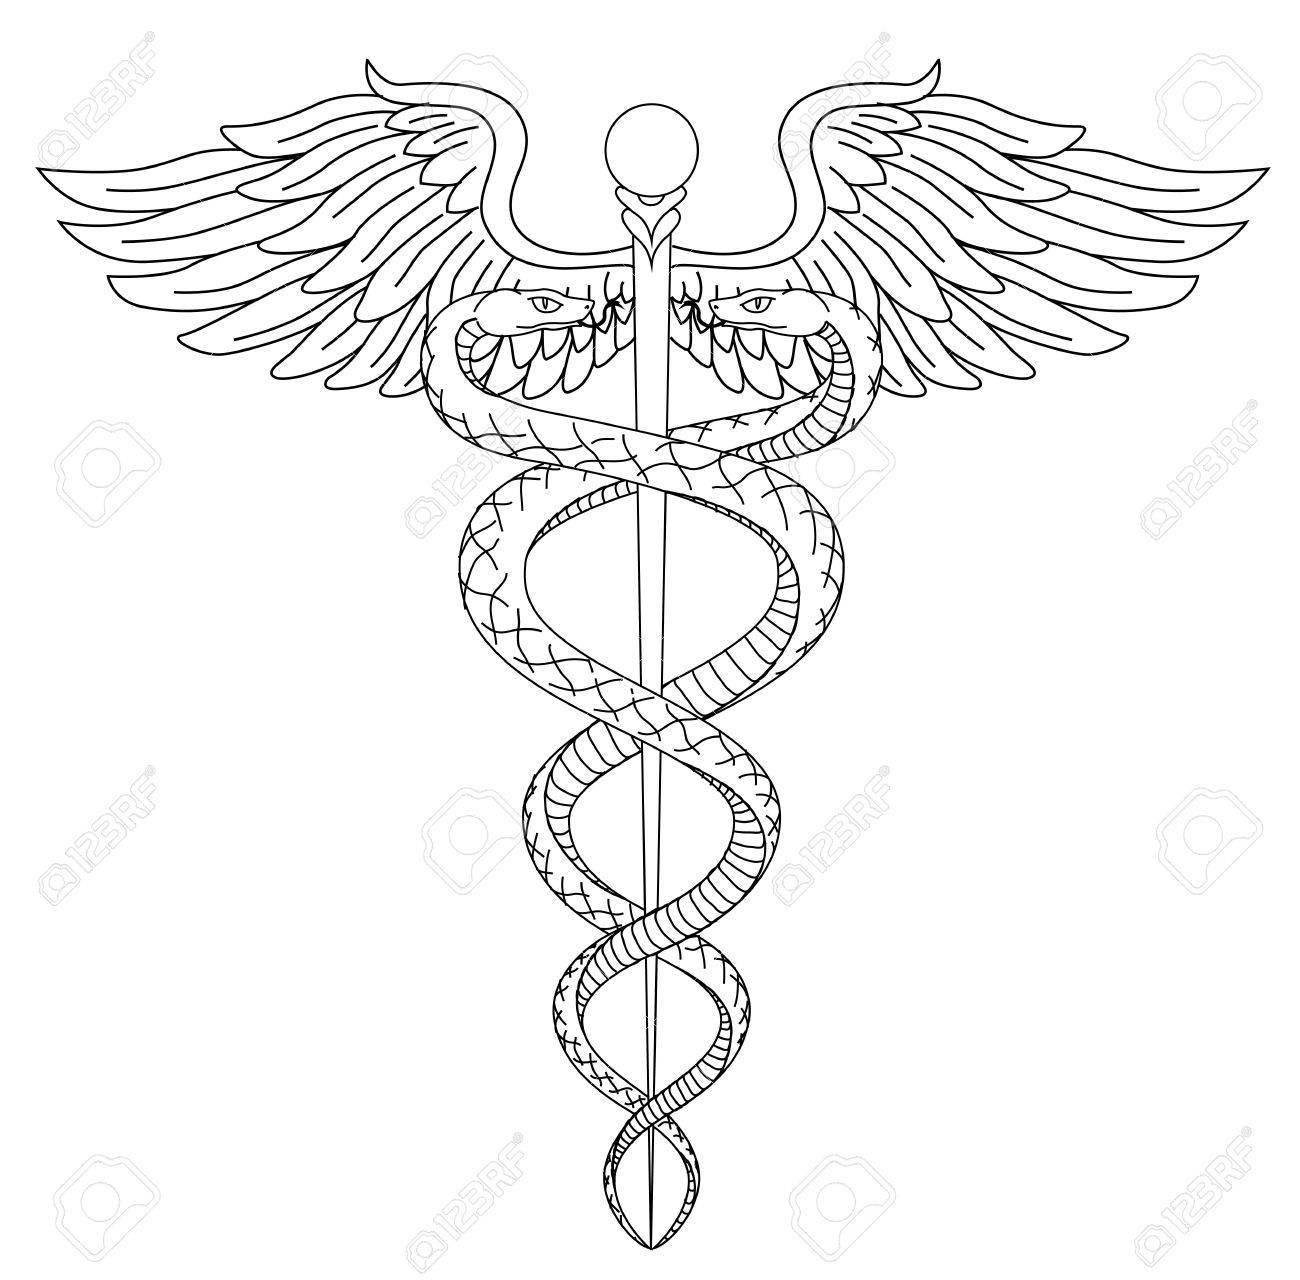 Cadeus Medical Medecine Pharmacy Doctor Acient Symbol Of The